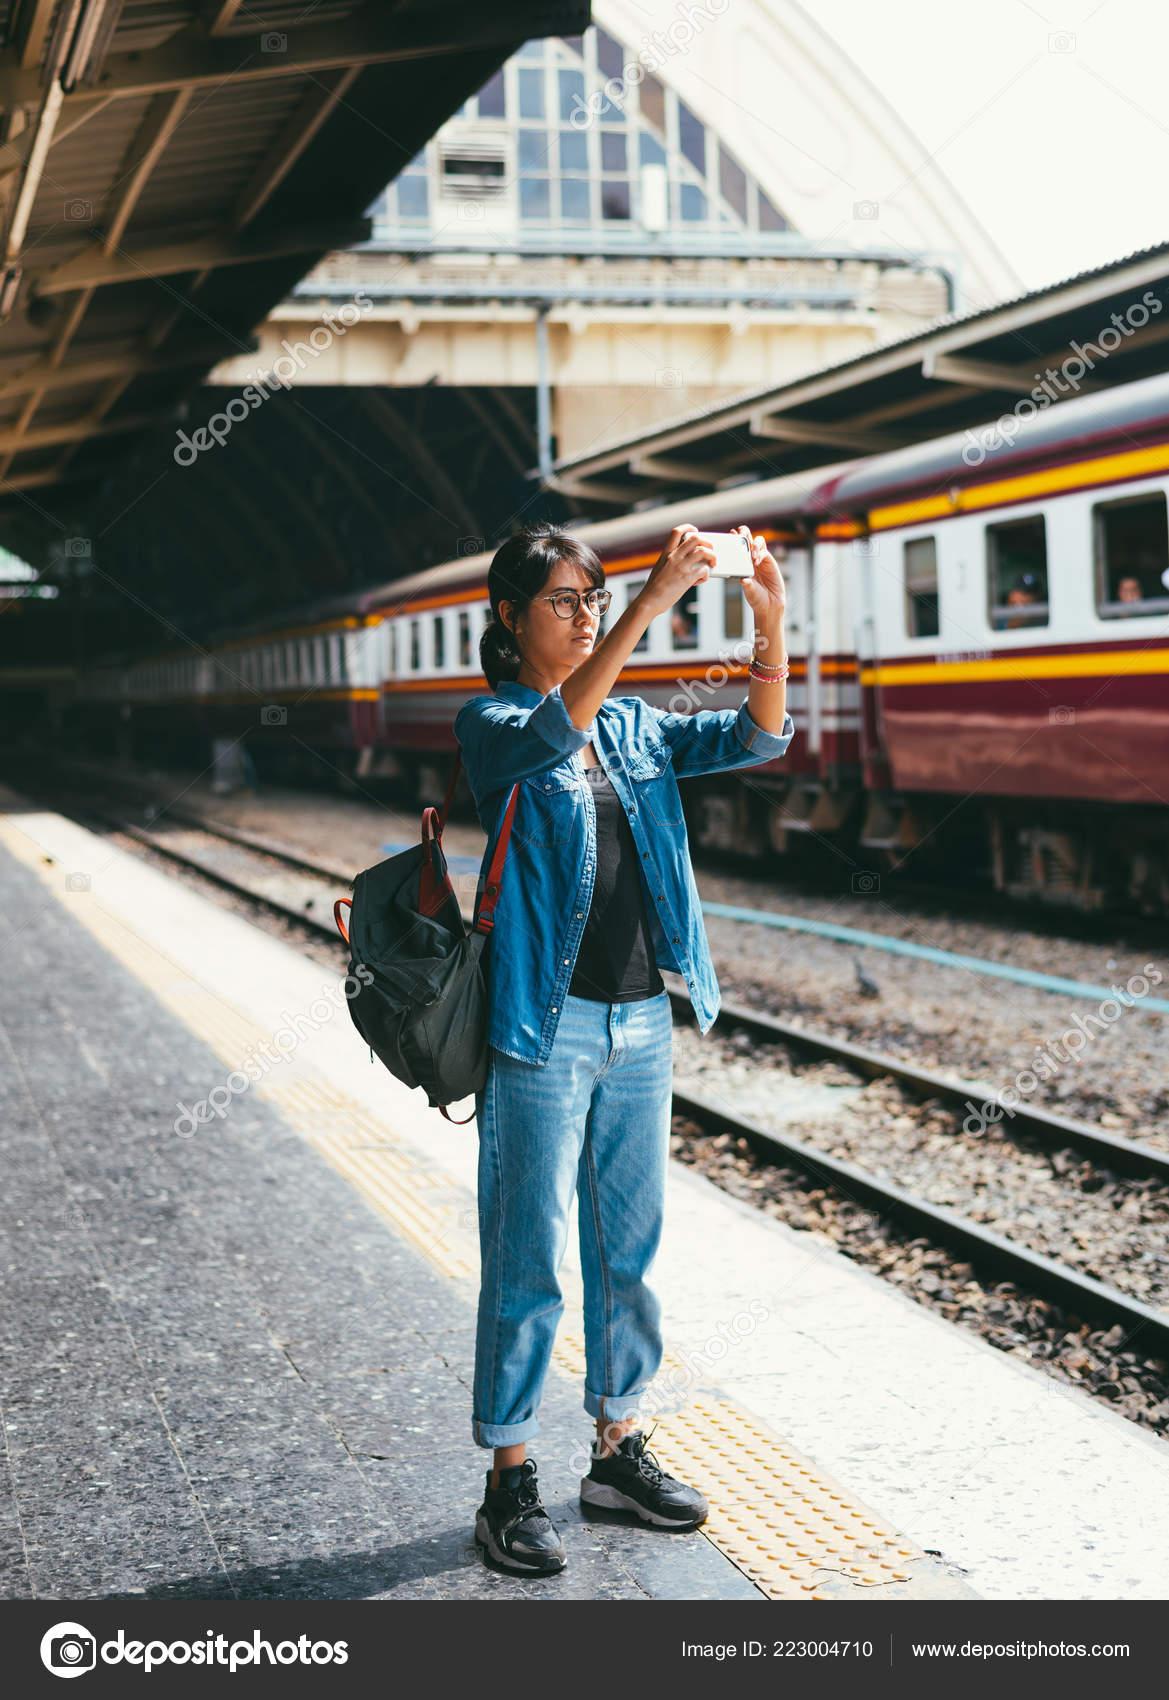 Азиатские девки на транспорте, эротический портрет фото